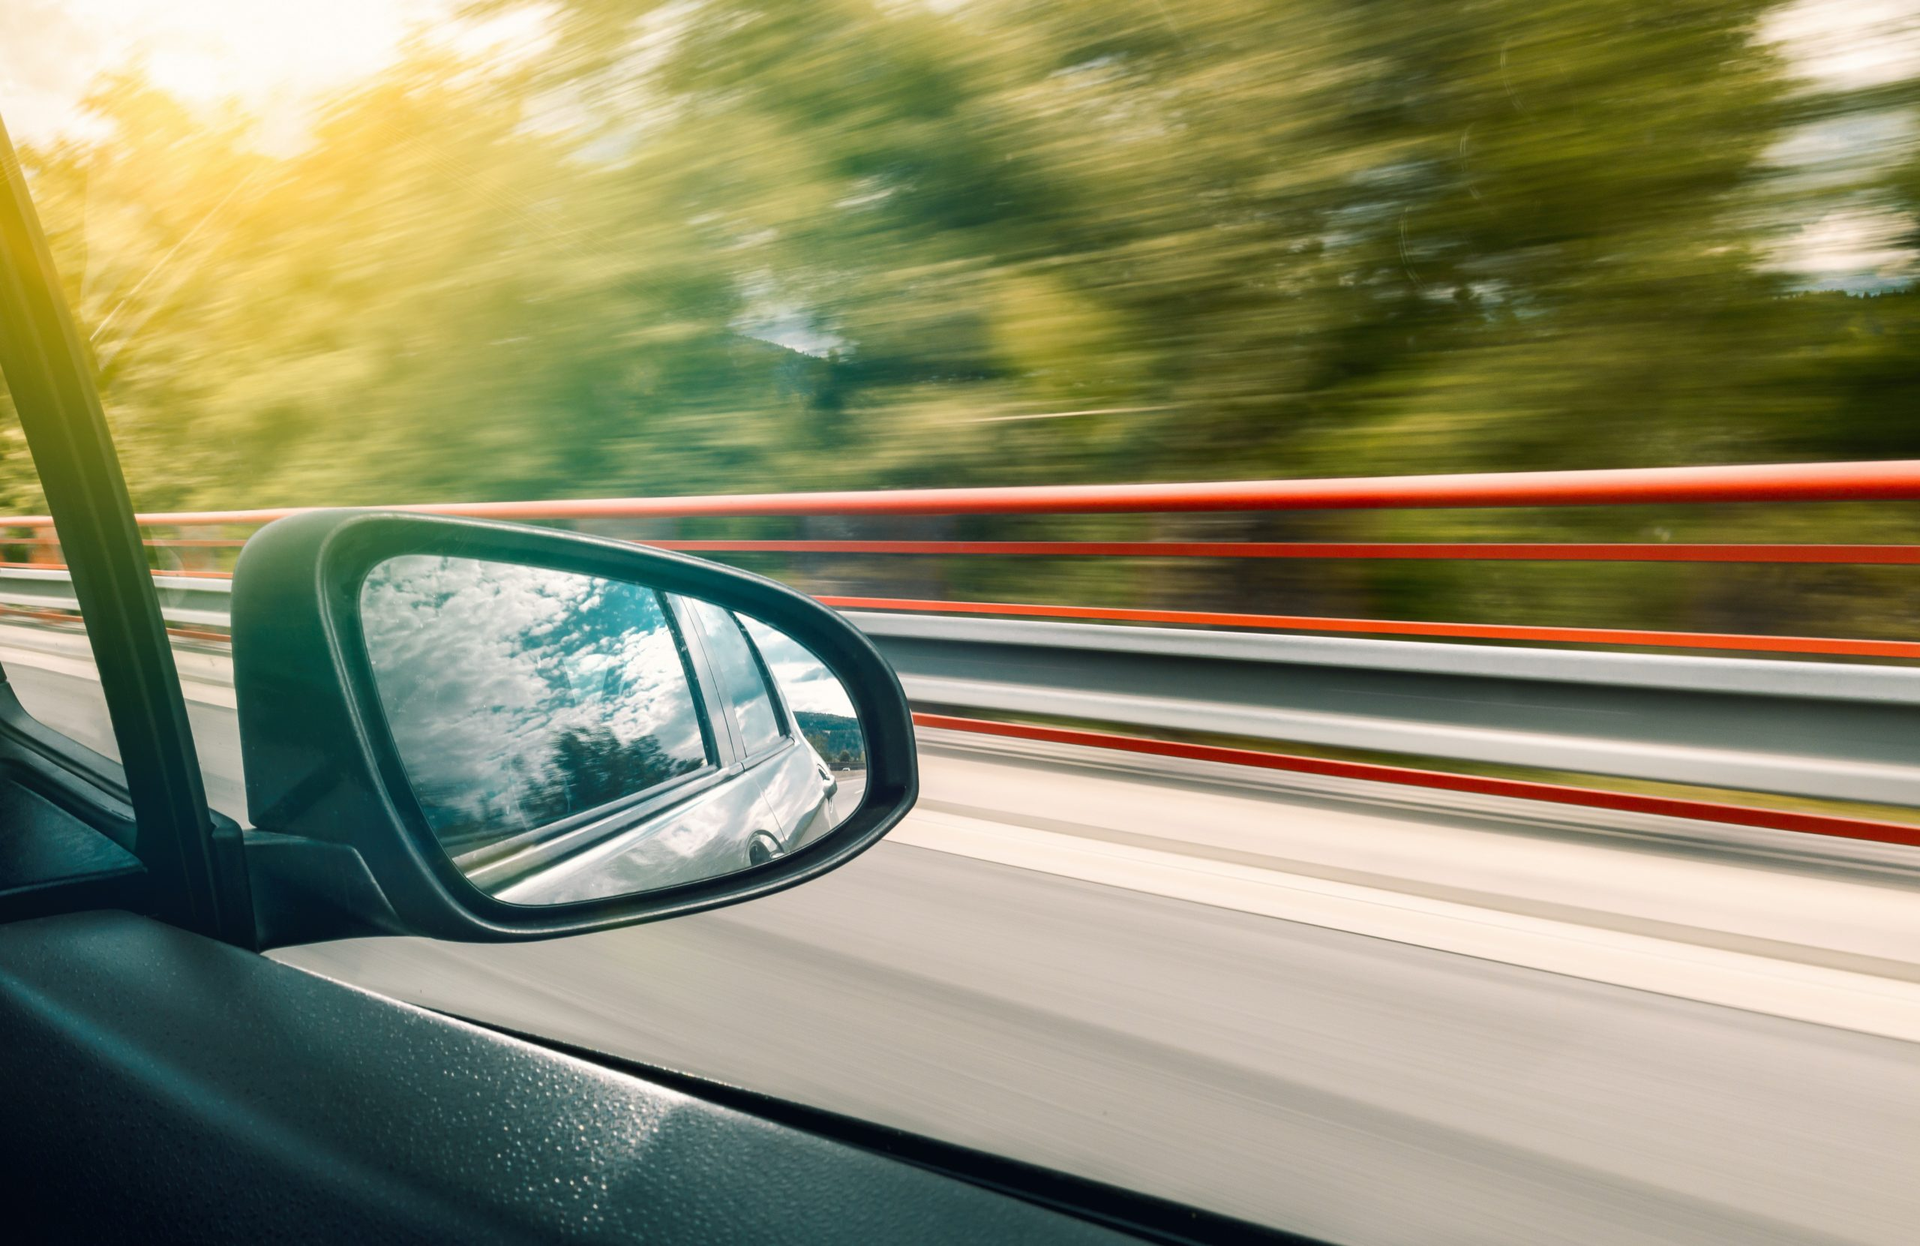 auto-automobile-automotive-blur-451590